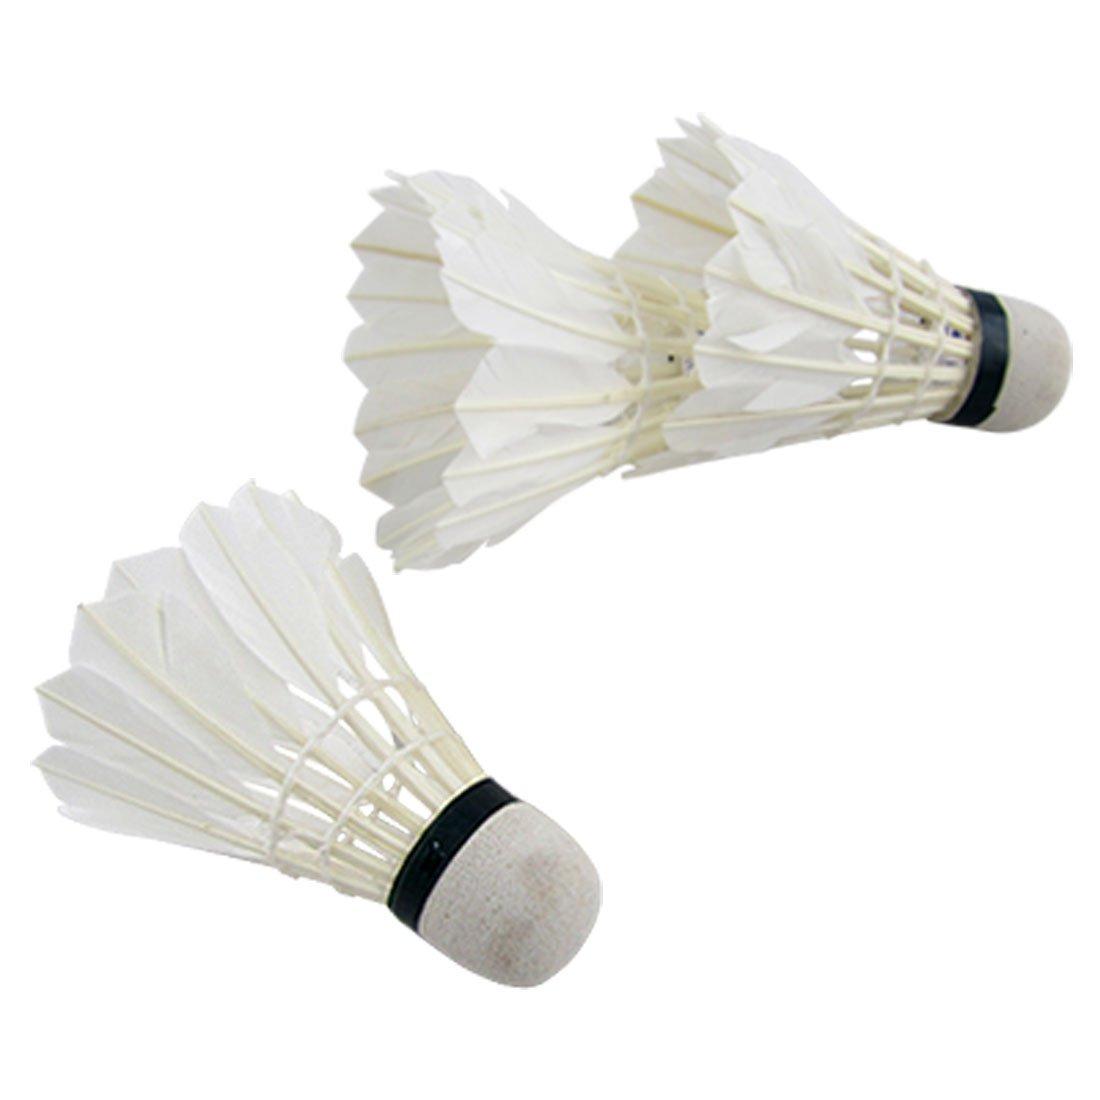 3Pcs Pluma Blanca Espuma Volantes Badminton Juego De Pelota ...